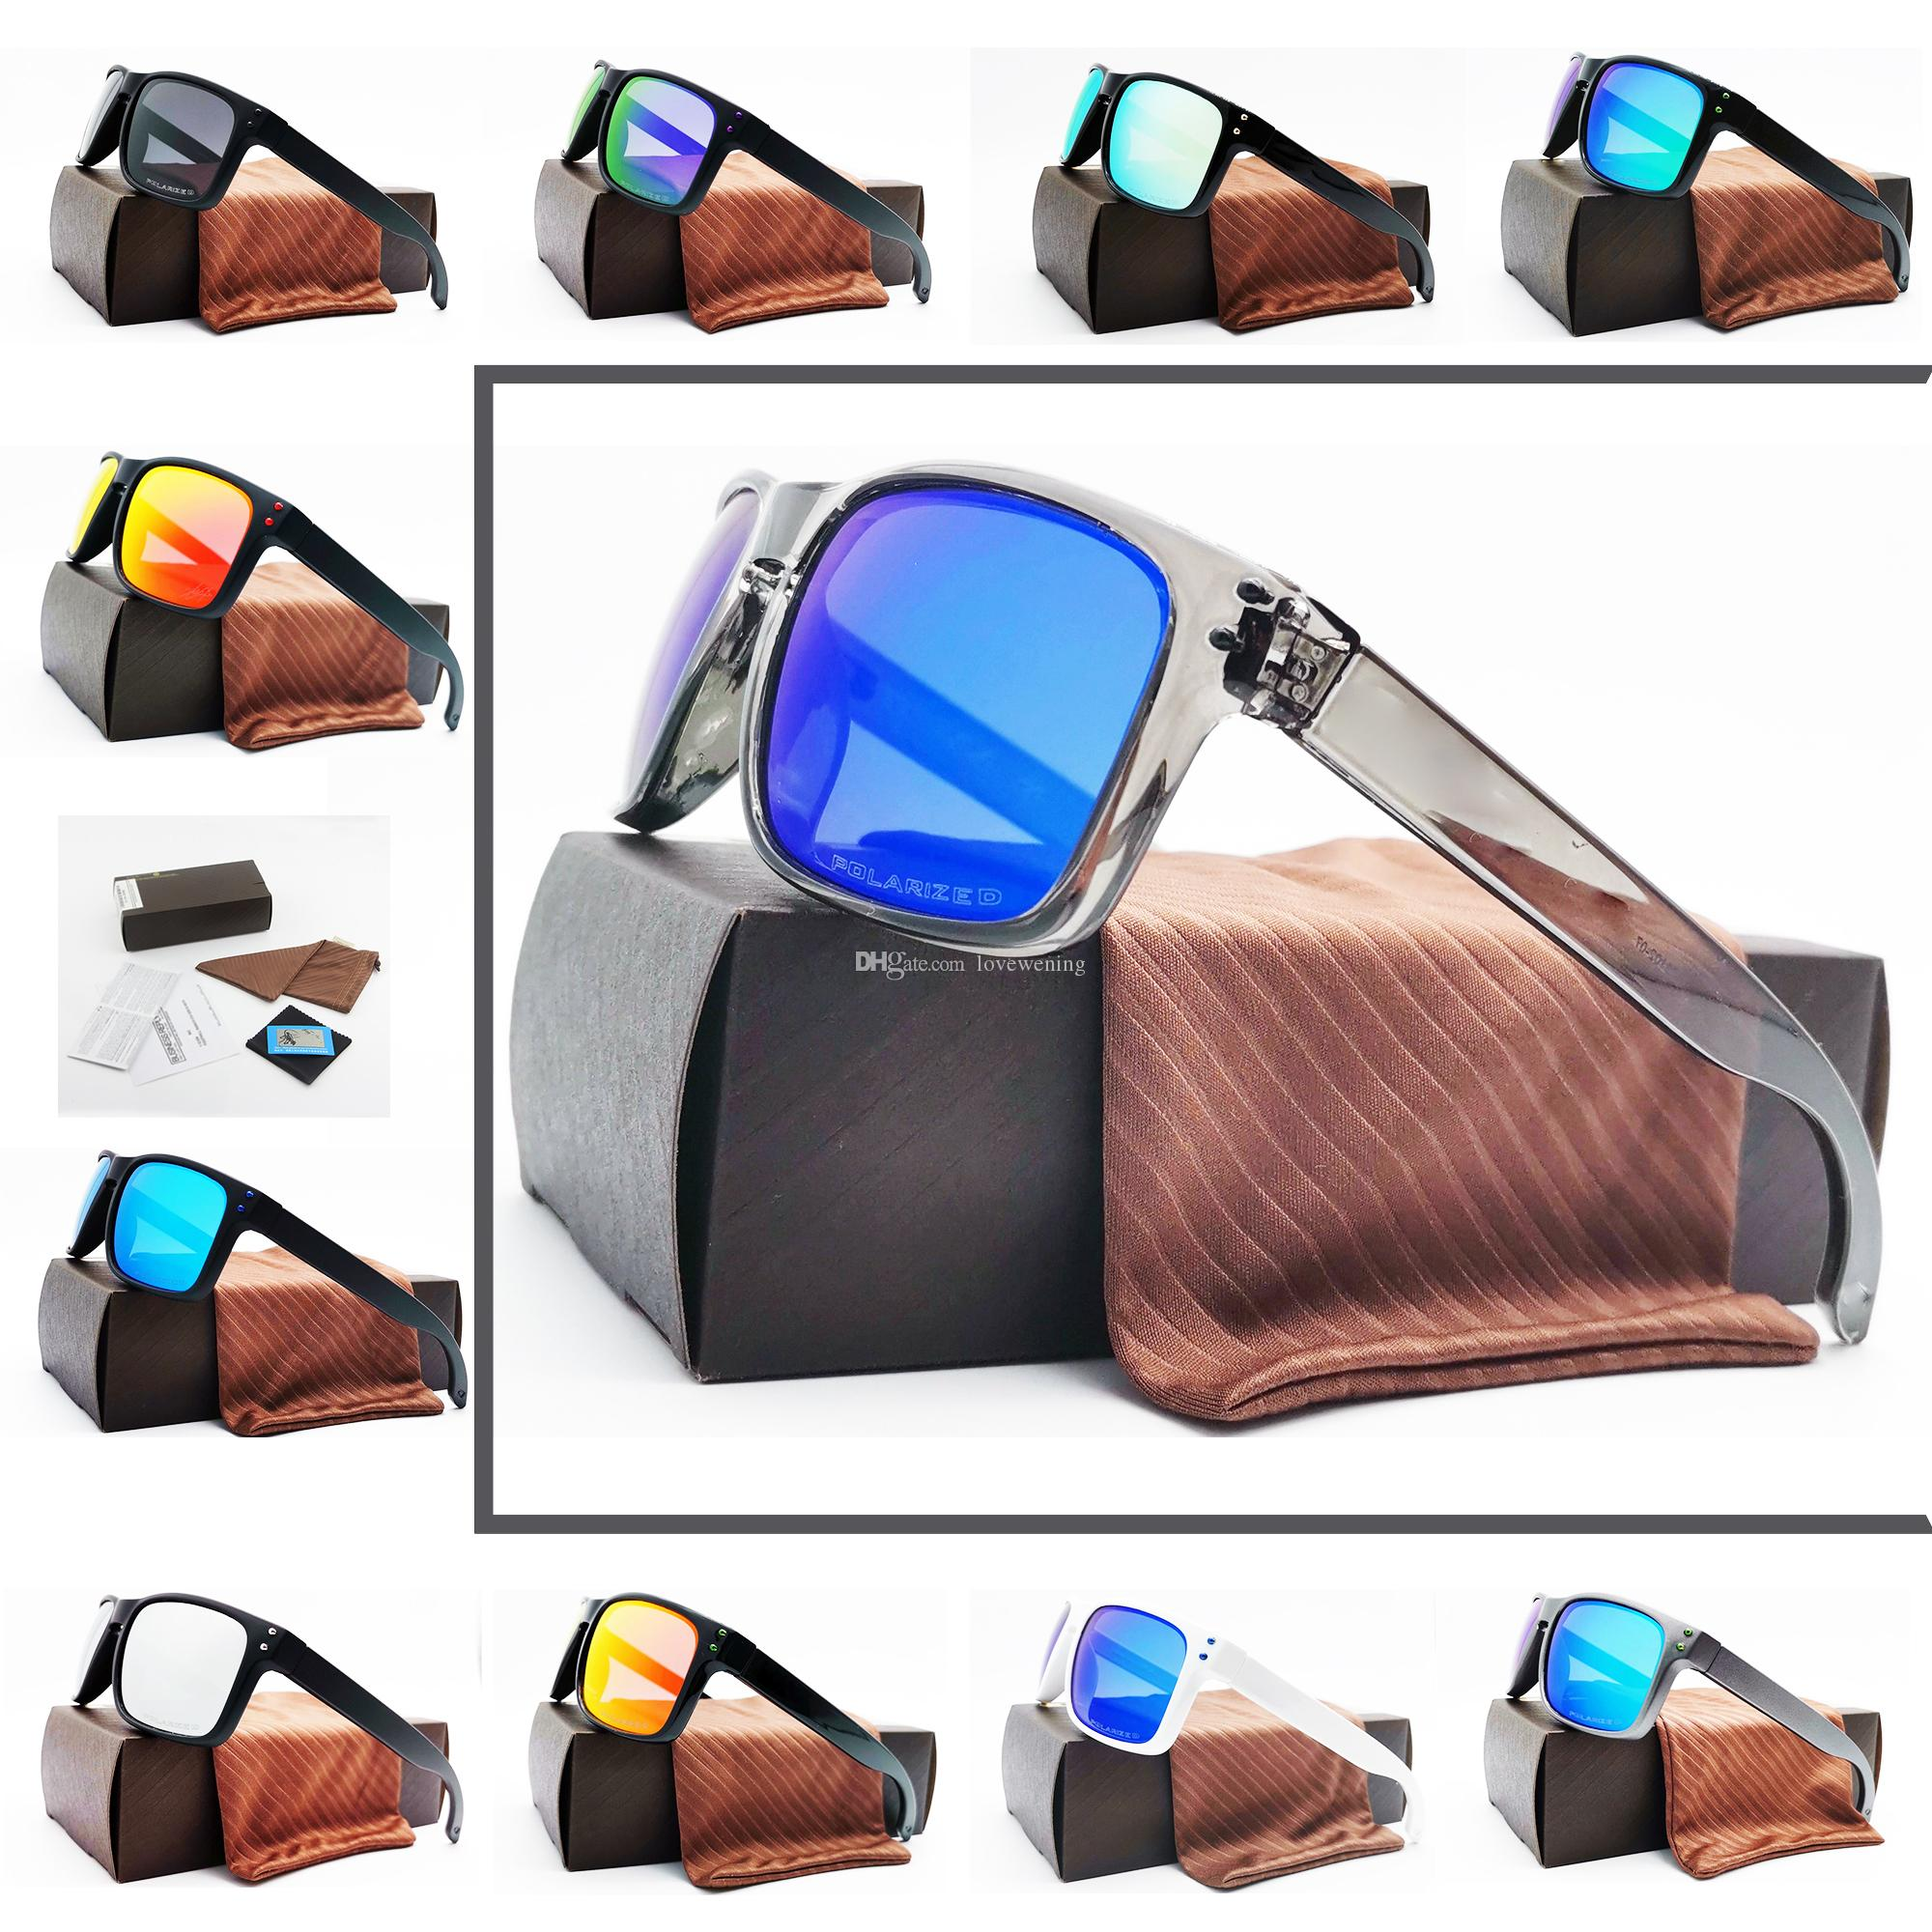 Estilo (11) sob encomenda da forma Esportes óculos de sol UV400 lente polarizada New YO91-02 alta classe de Homens New Outdoor Óculos frete grátis